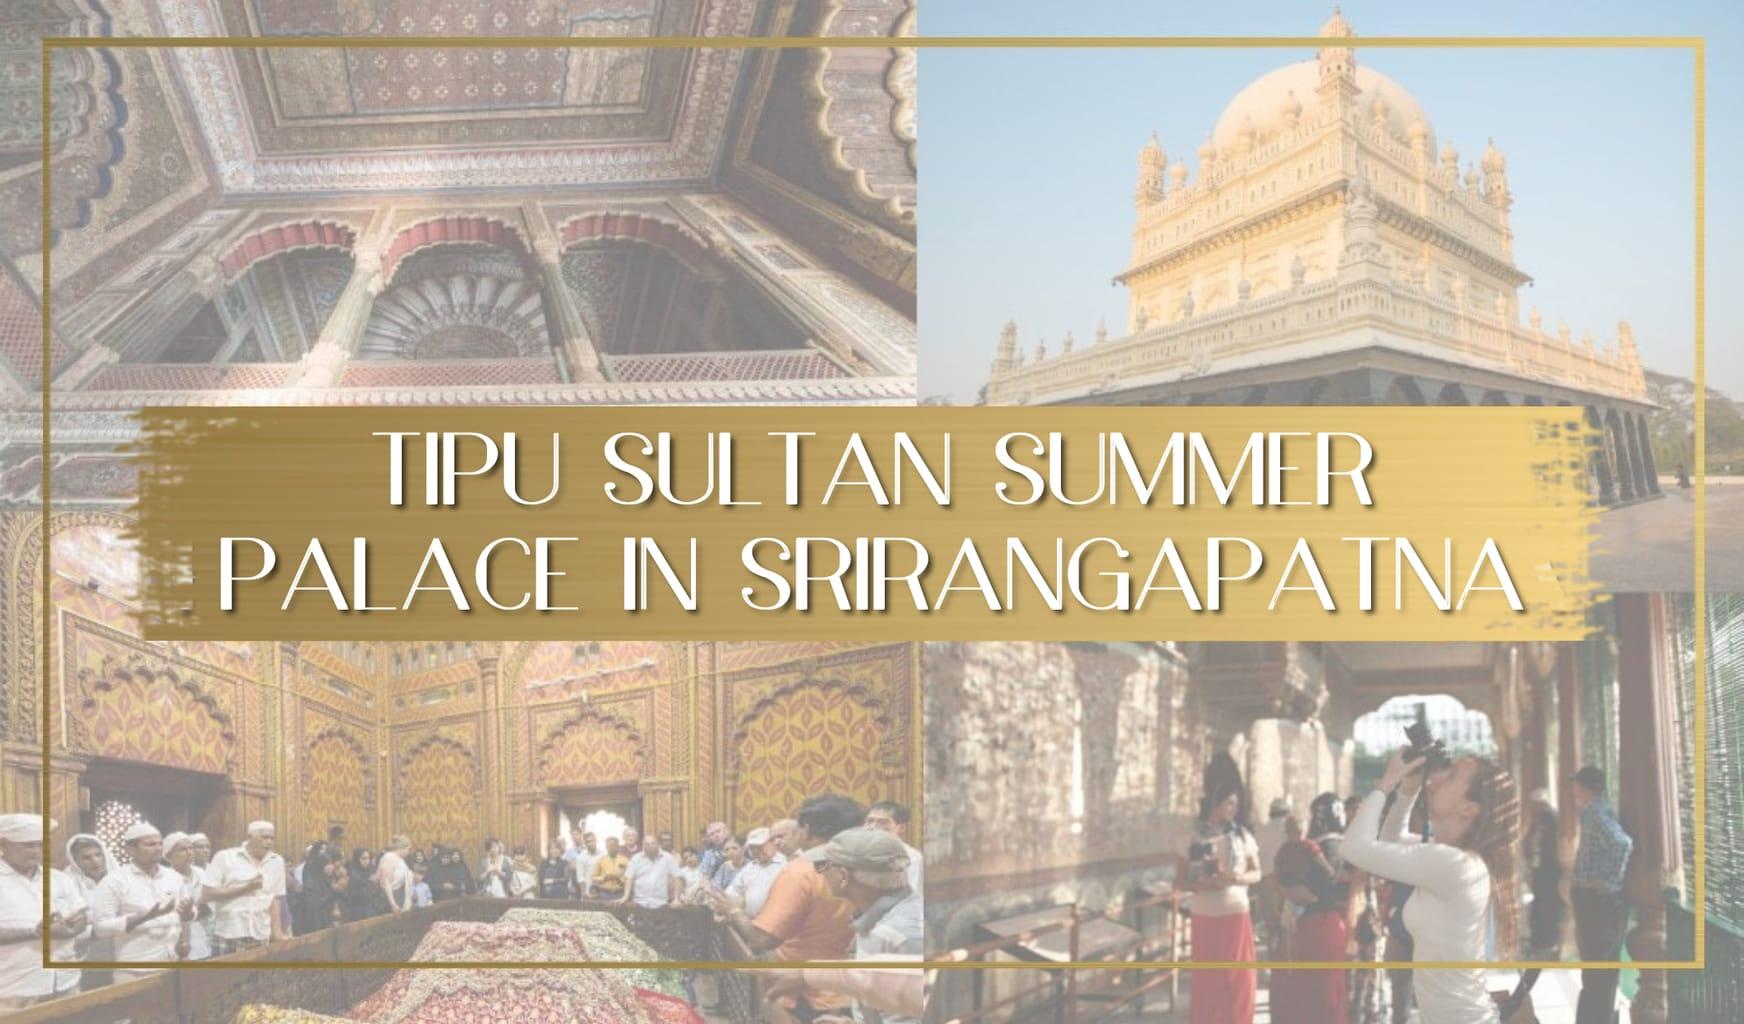 Tipu Sultan Summer Palace in Srirangapatna main